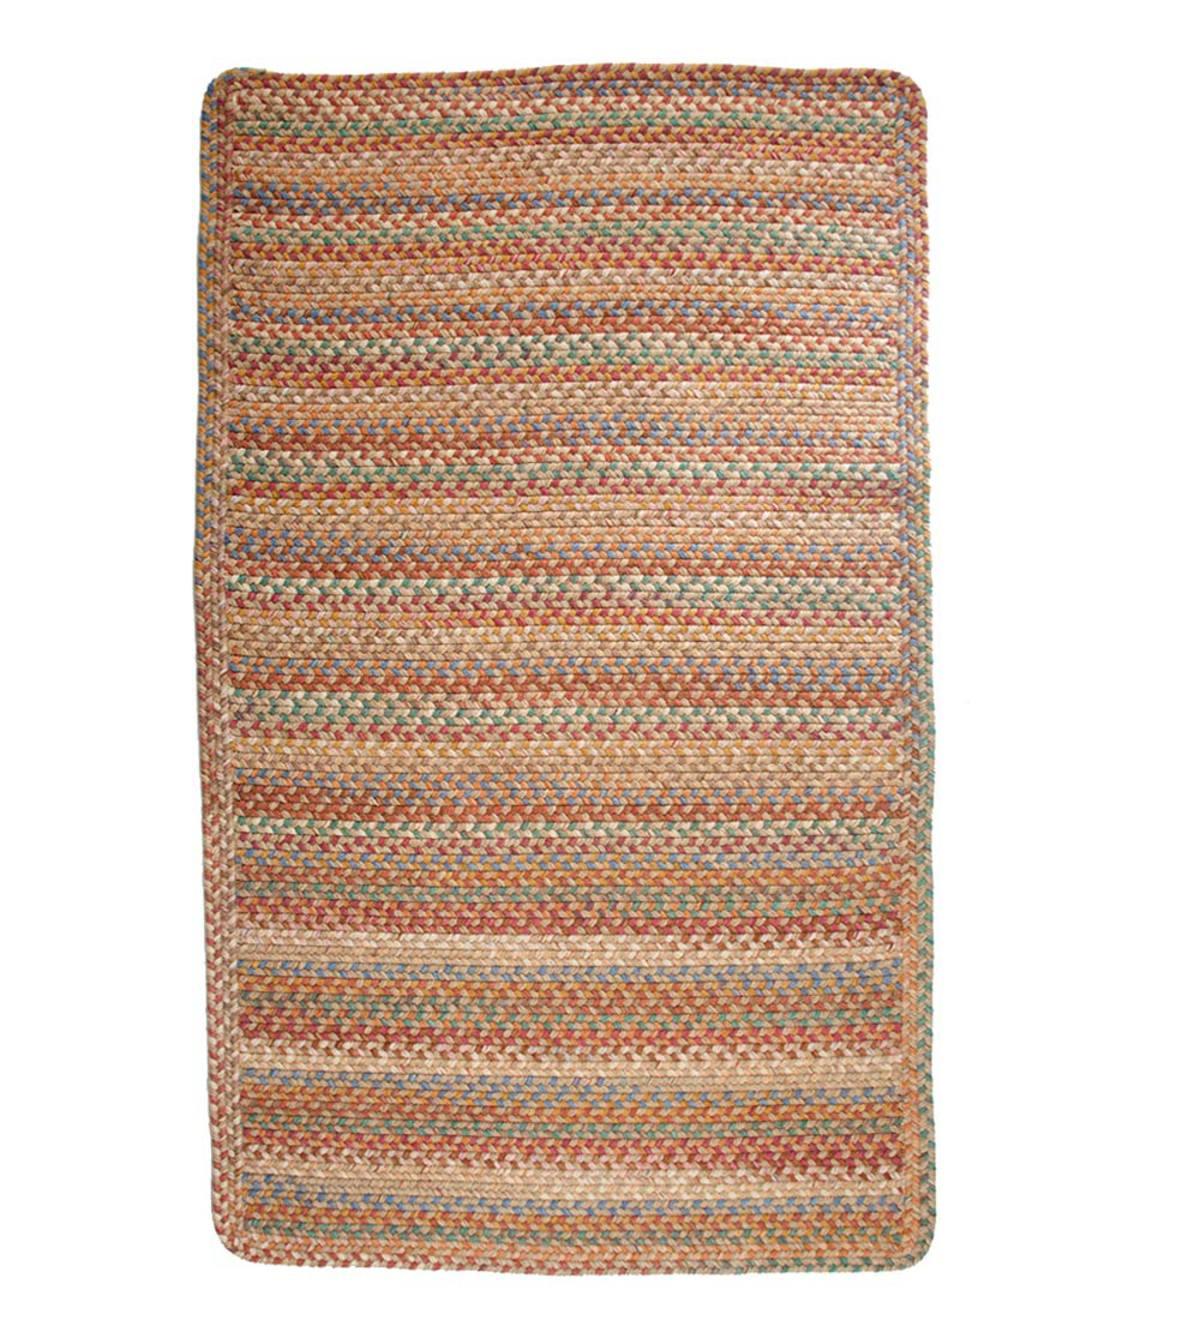 Blue Ridge Rectangle Wool Braided Rug 8 X 11 Moss